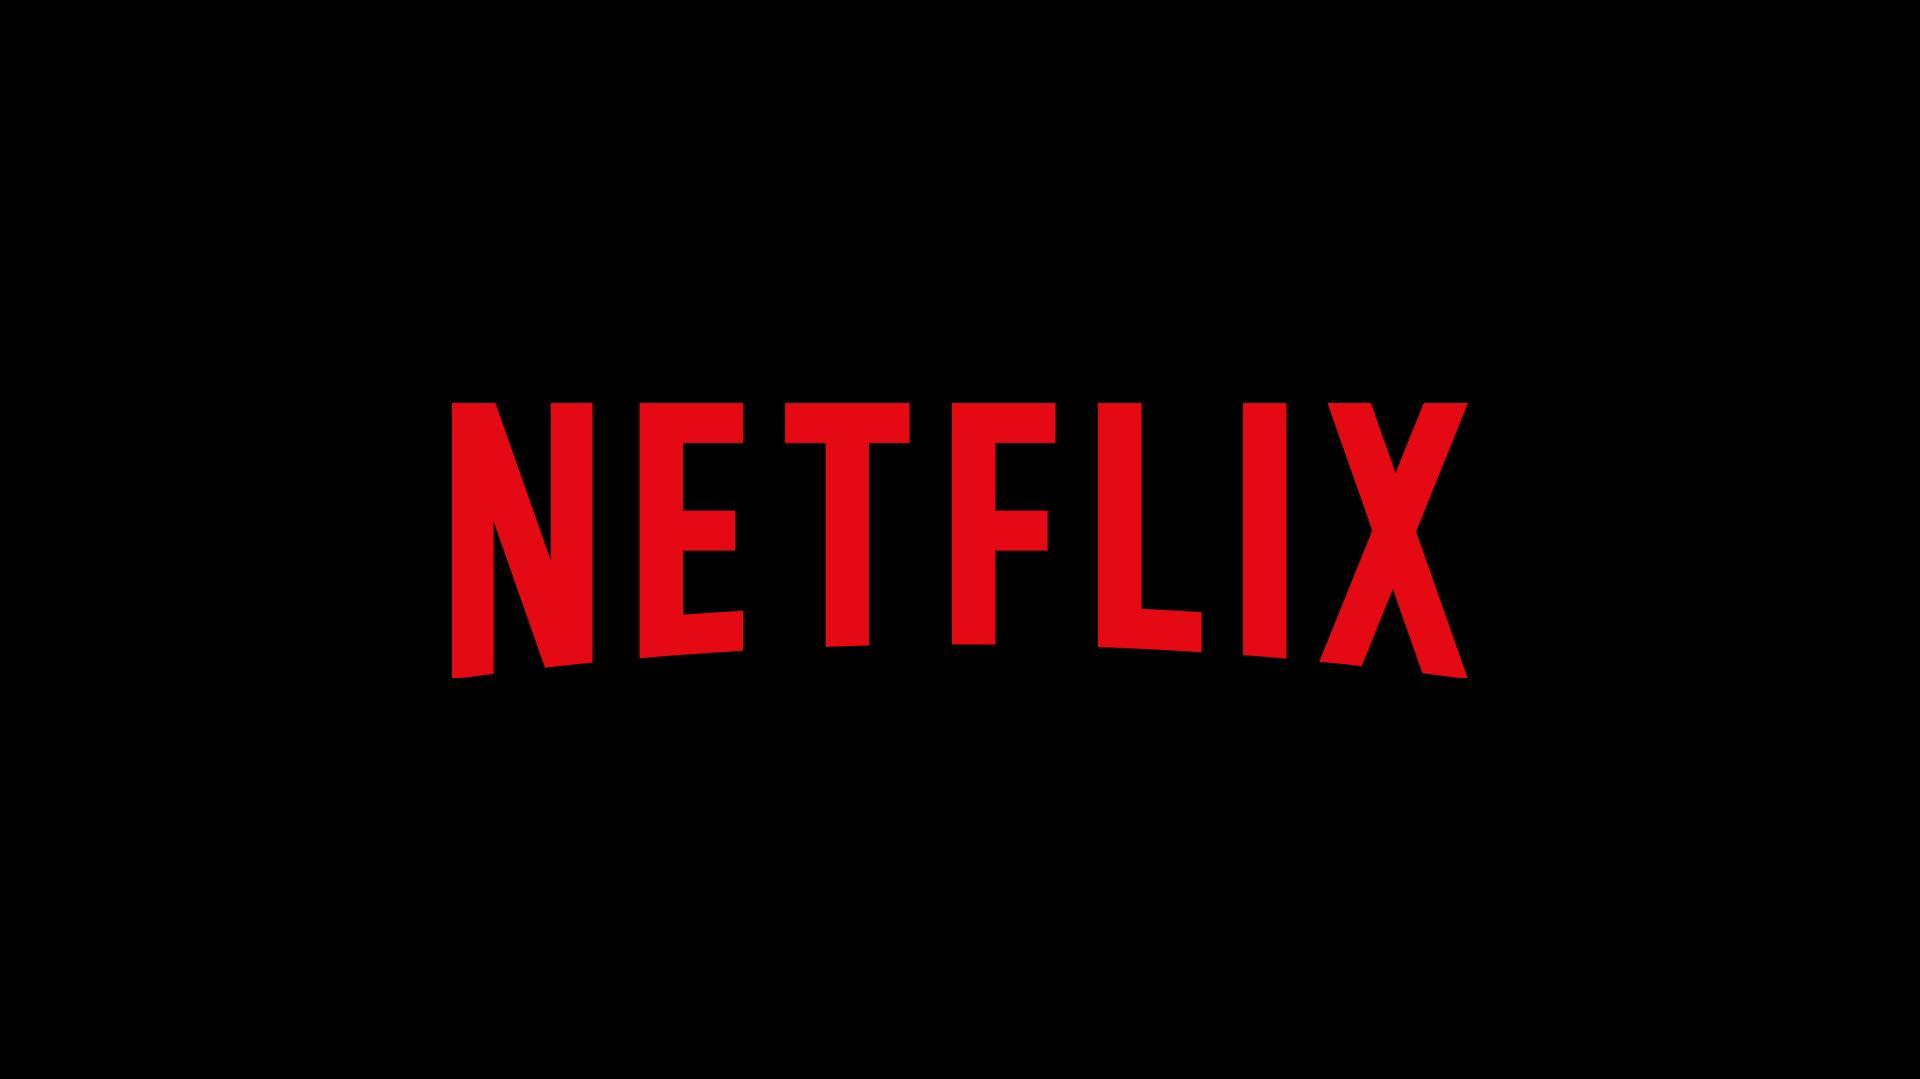 Netflix 3 Monate Gratis